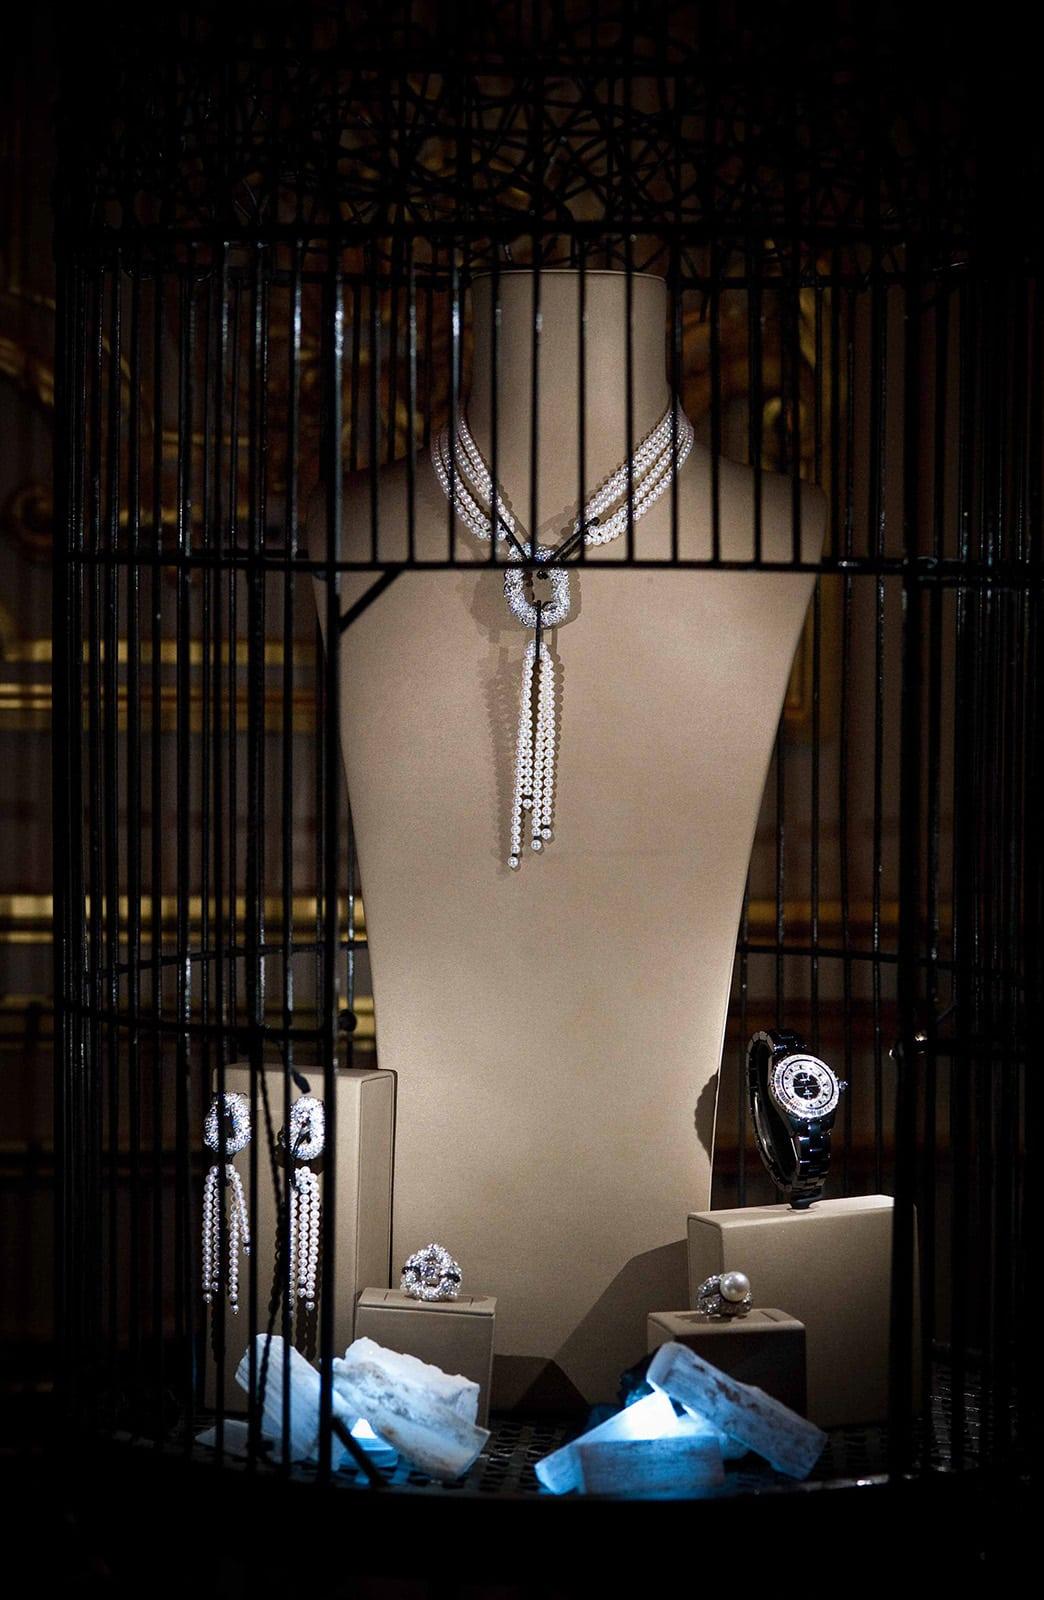 Studio photos entreprise  AE image branding 34